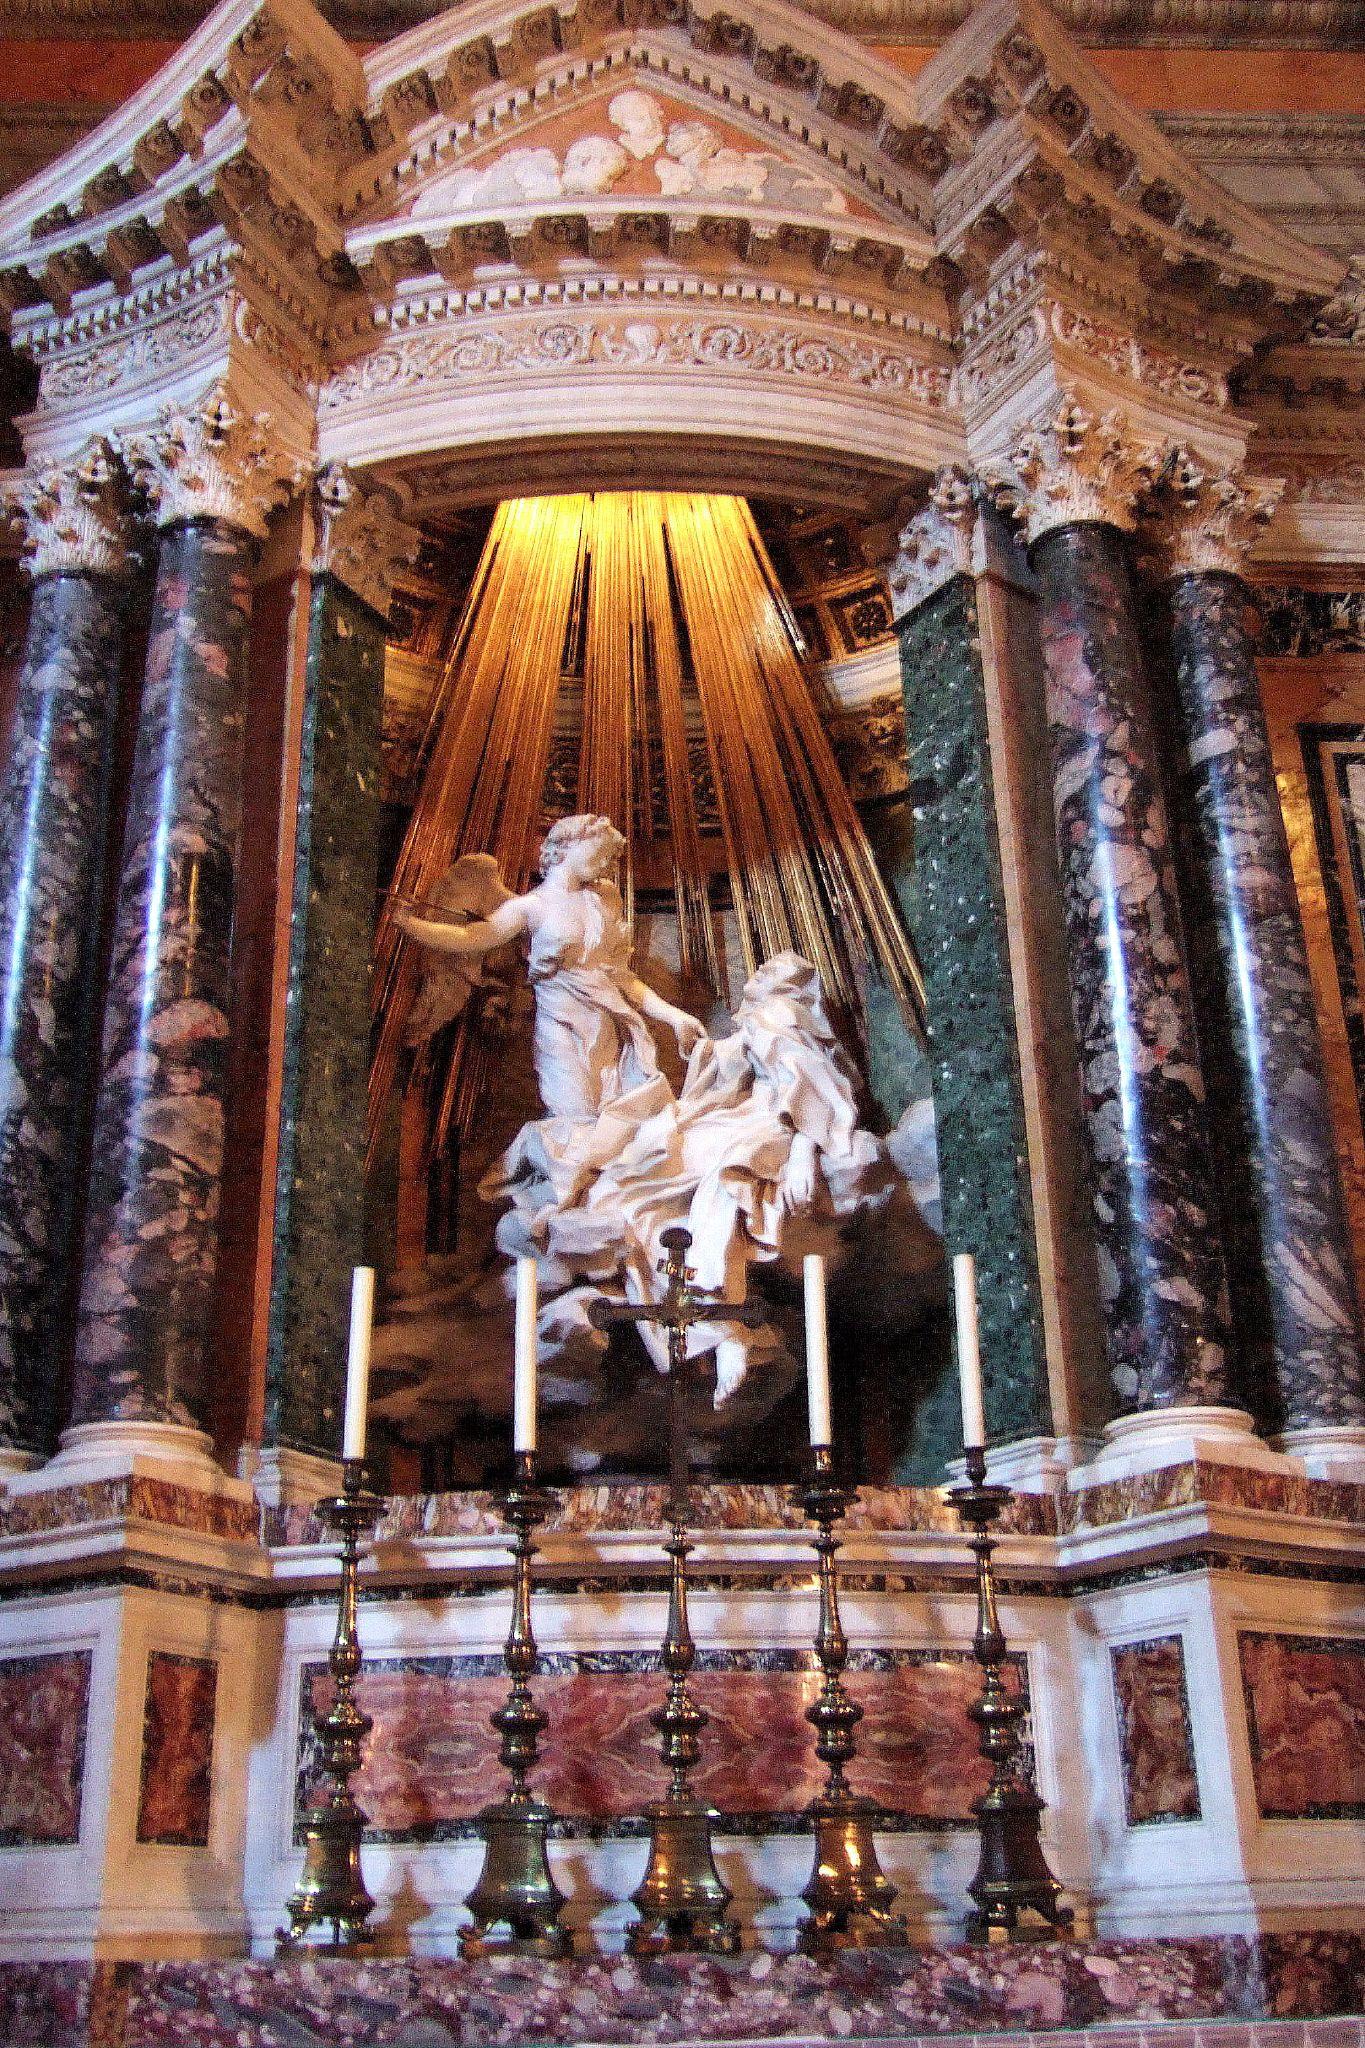 http://upload.wikimedia.org/wikipedia/commons/3/3e/Estasi_di_Santa_Teresa.jpg